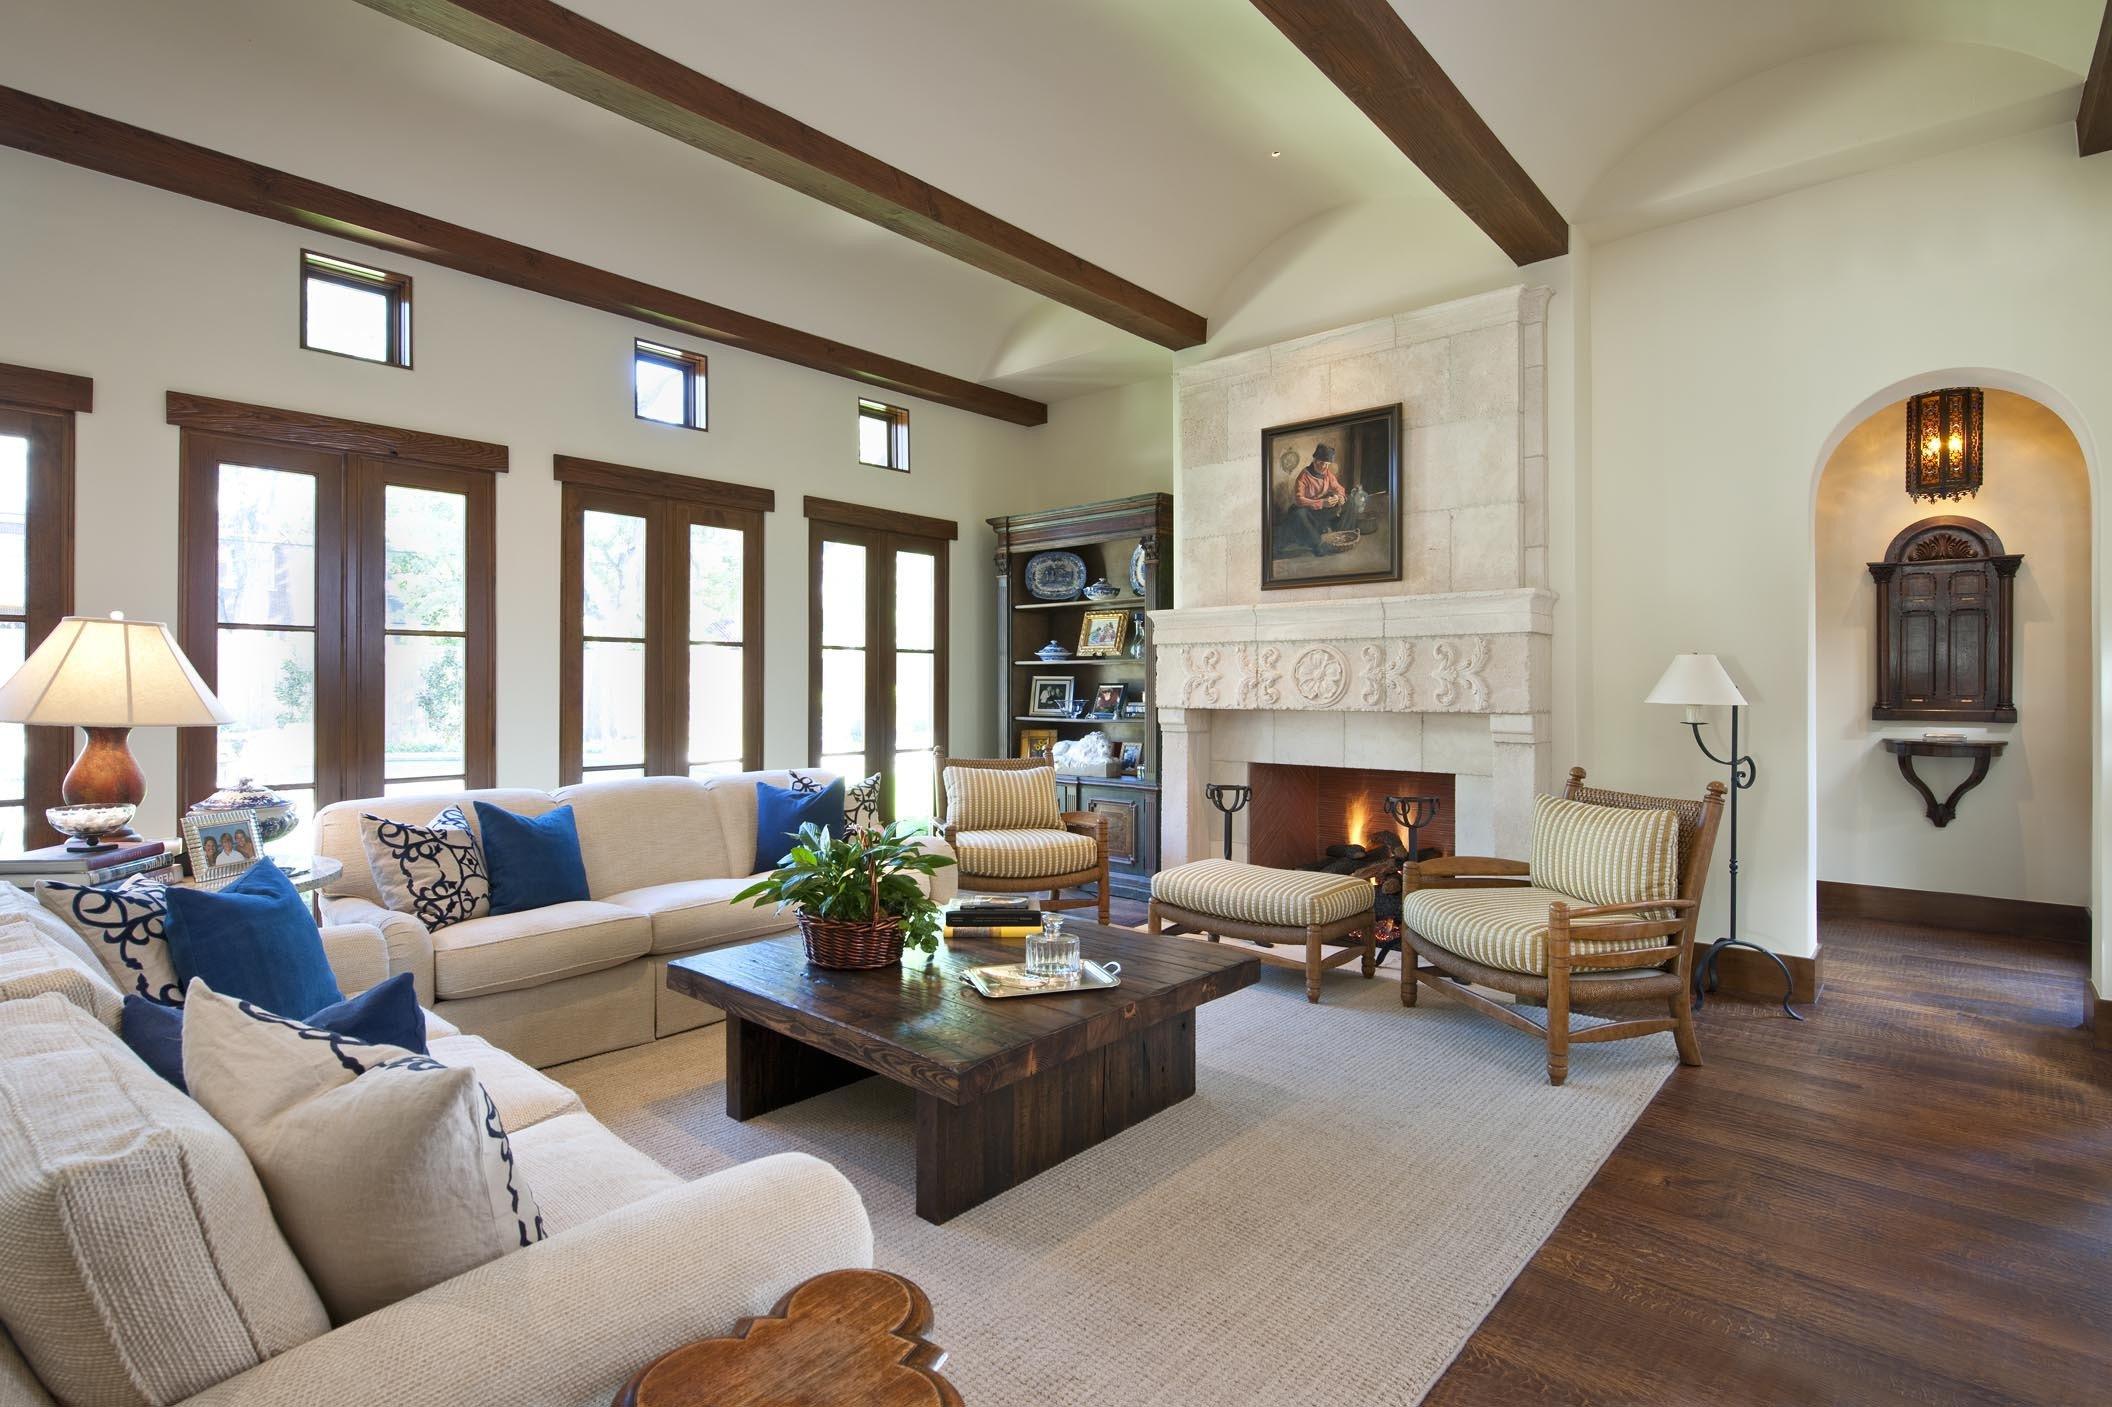 Modern Mediterranean Living Room Decorating Ideas Mediterranean Living Room Design with Relaxed Mood